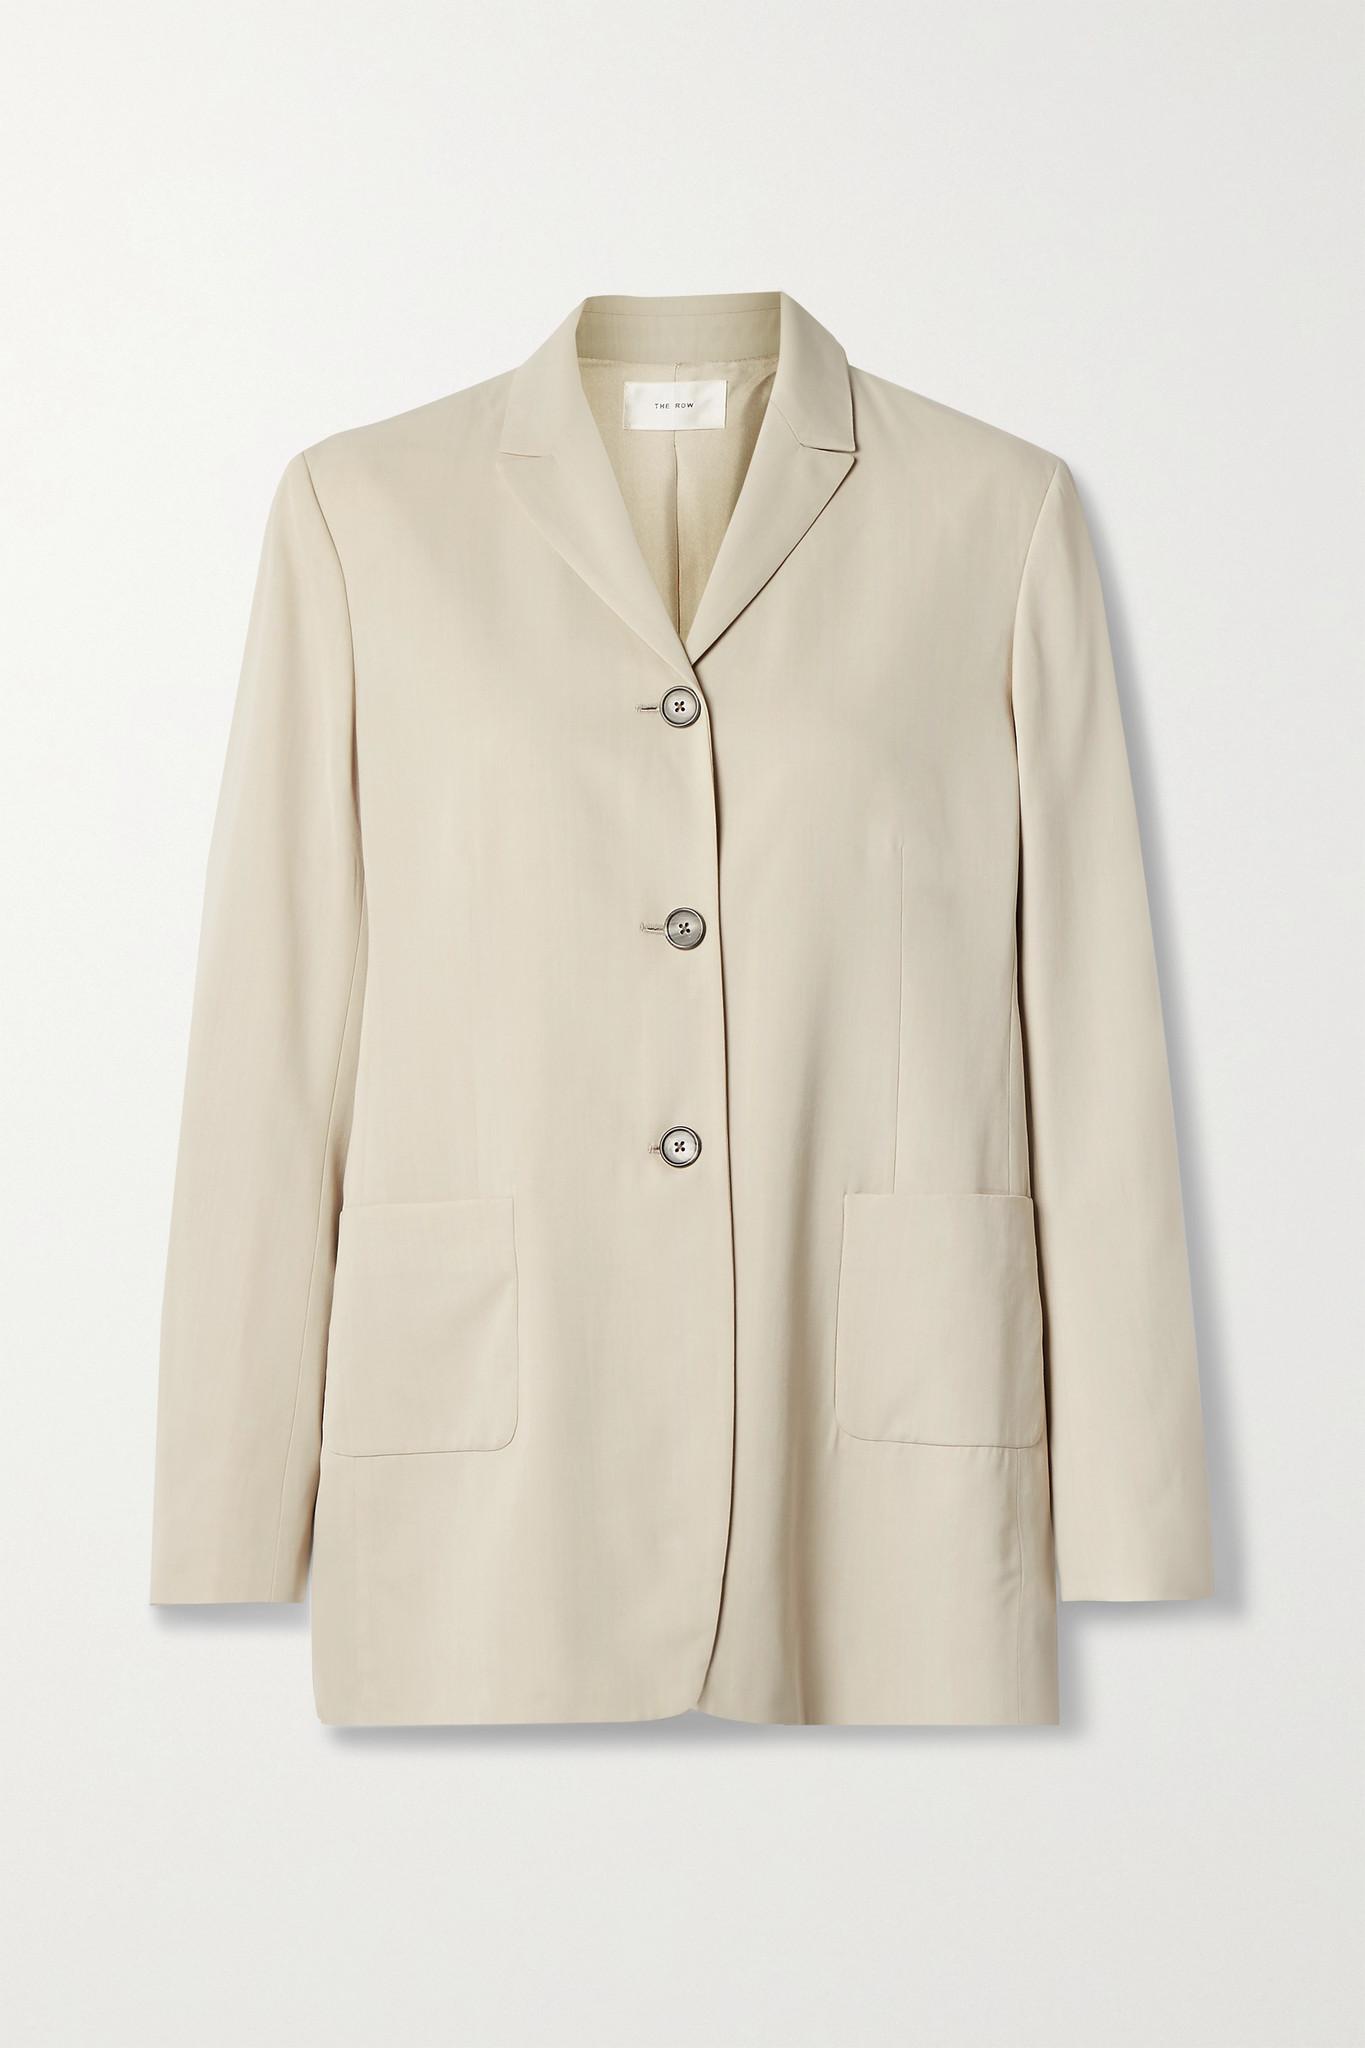 THE ROW - Giedre Woven Blazer - Cream - US0